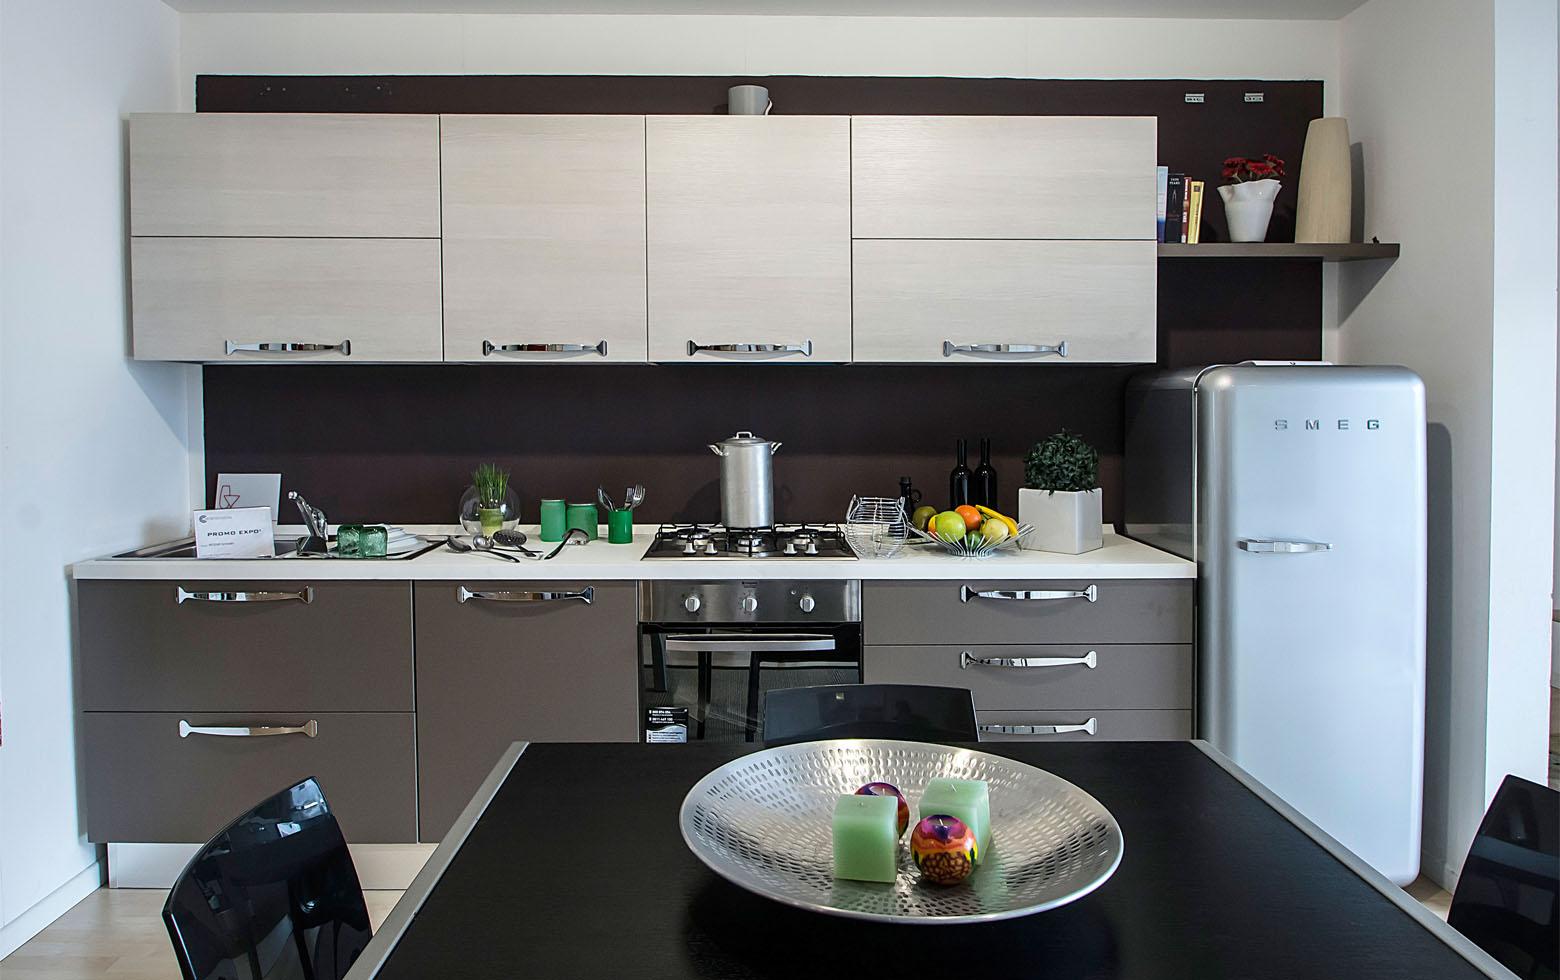 Offerte cucine esposizione simple cucine outlet classiche moderne rustiche da esposizione for Cucine classiche in offerta